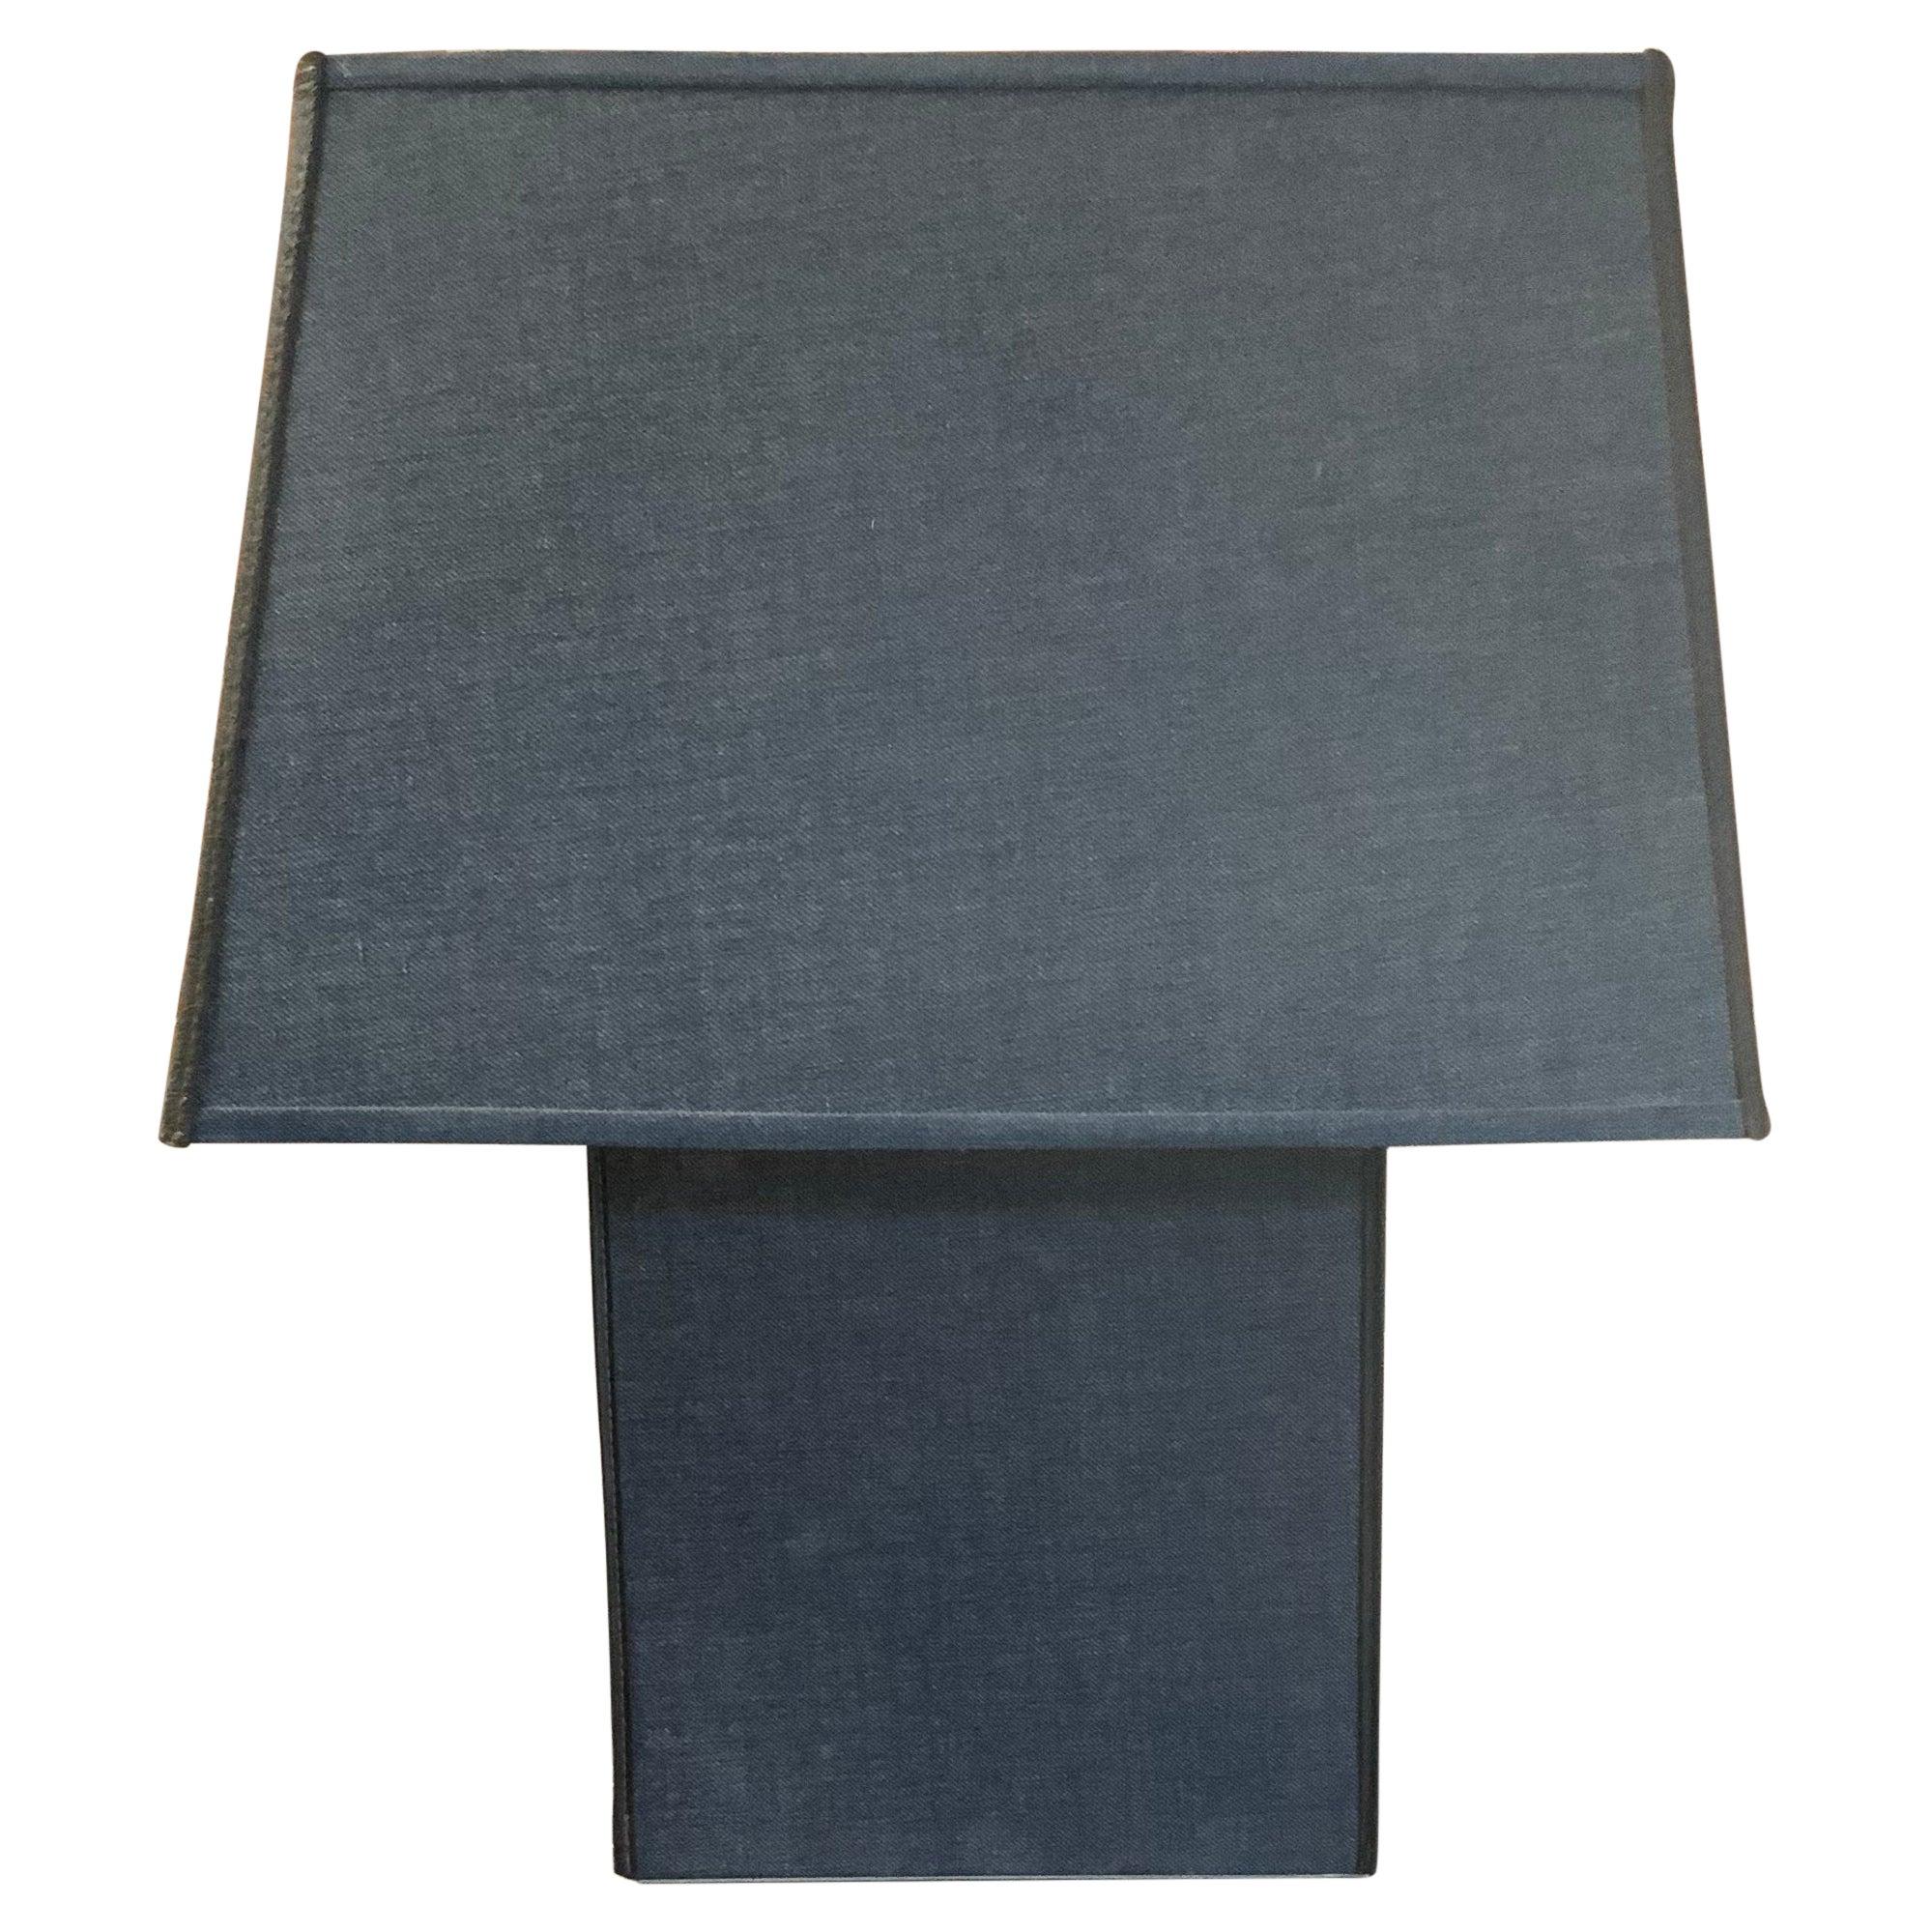 1970s Kovacs Denim Clad Table Lamp